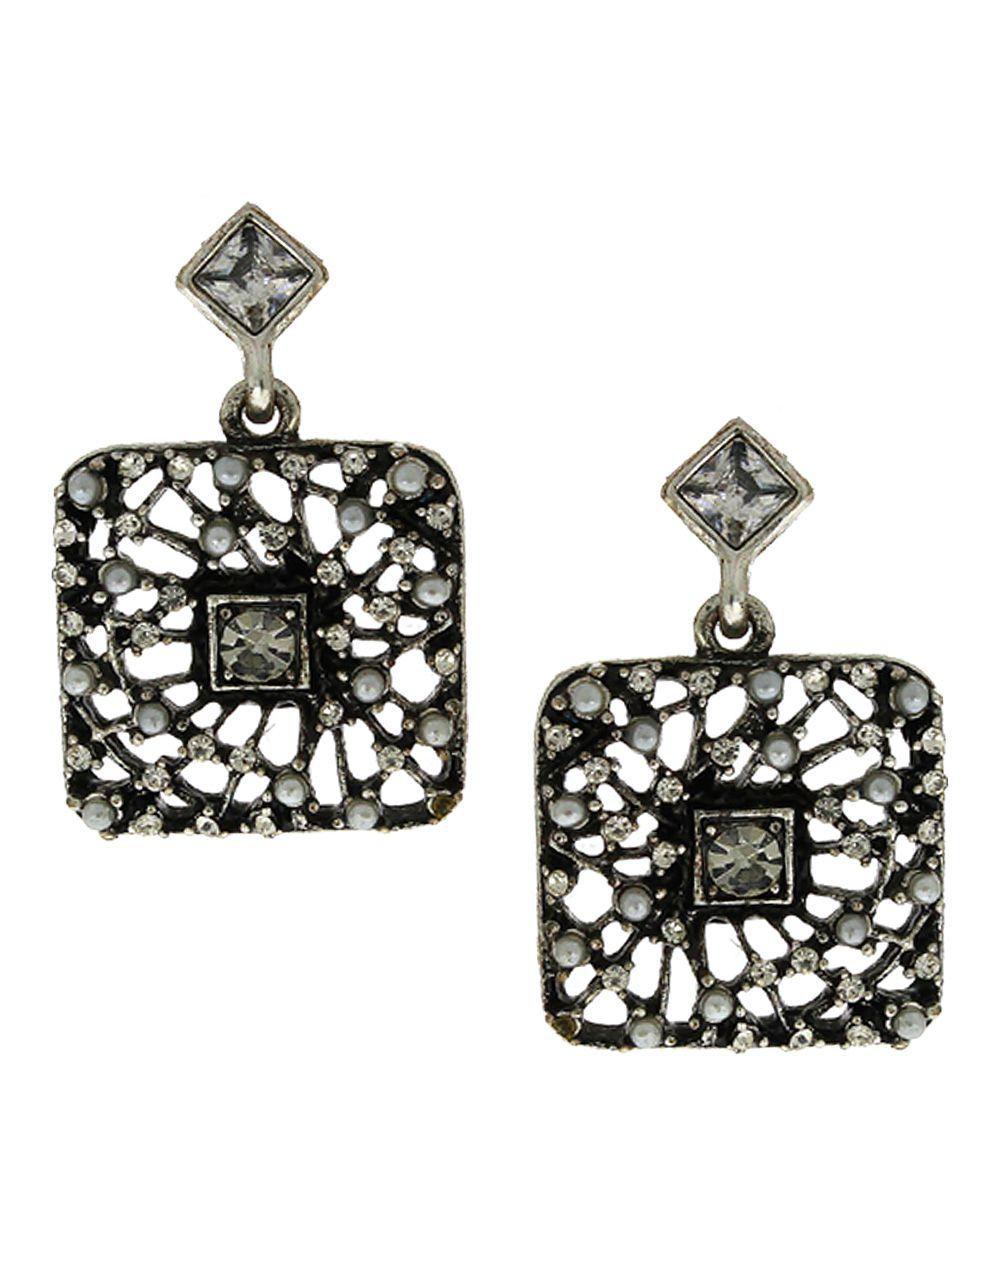 Anuradha Art Silver-Black Combination Very Pretty Designer Earrings For Women/Girls